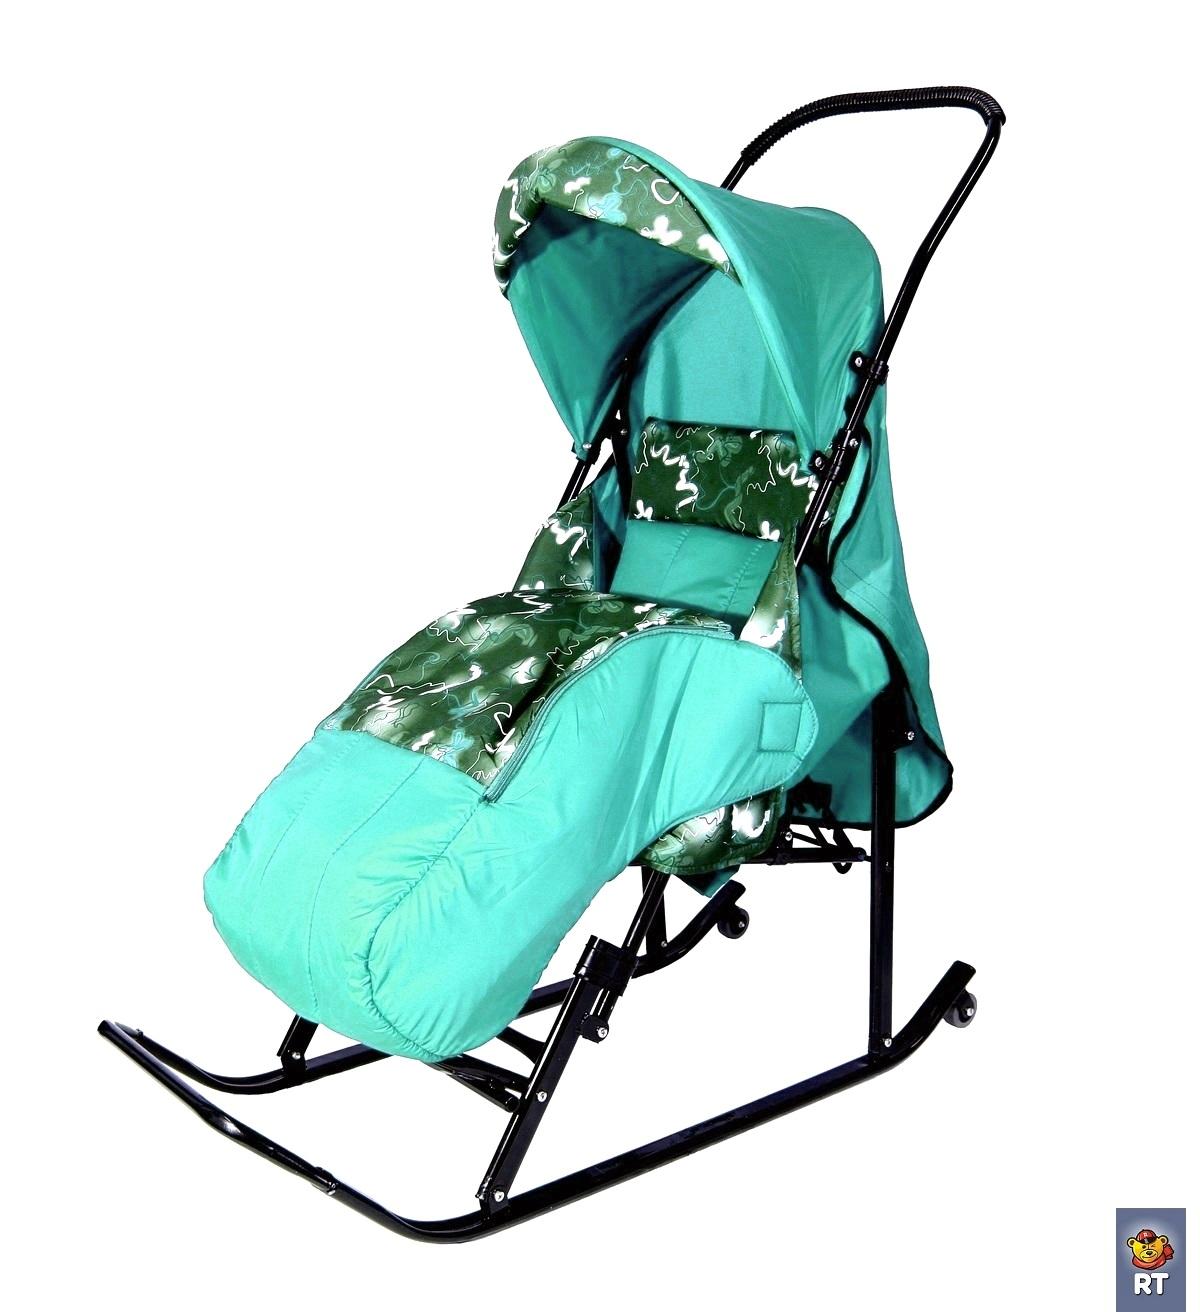 Купить Санки-коляска «Шустрик» Имго-6 с колесиками. Бирюза, RT